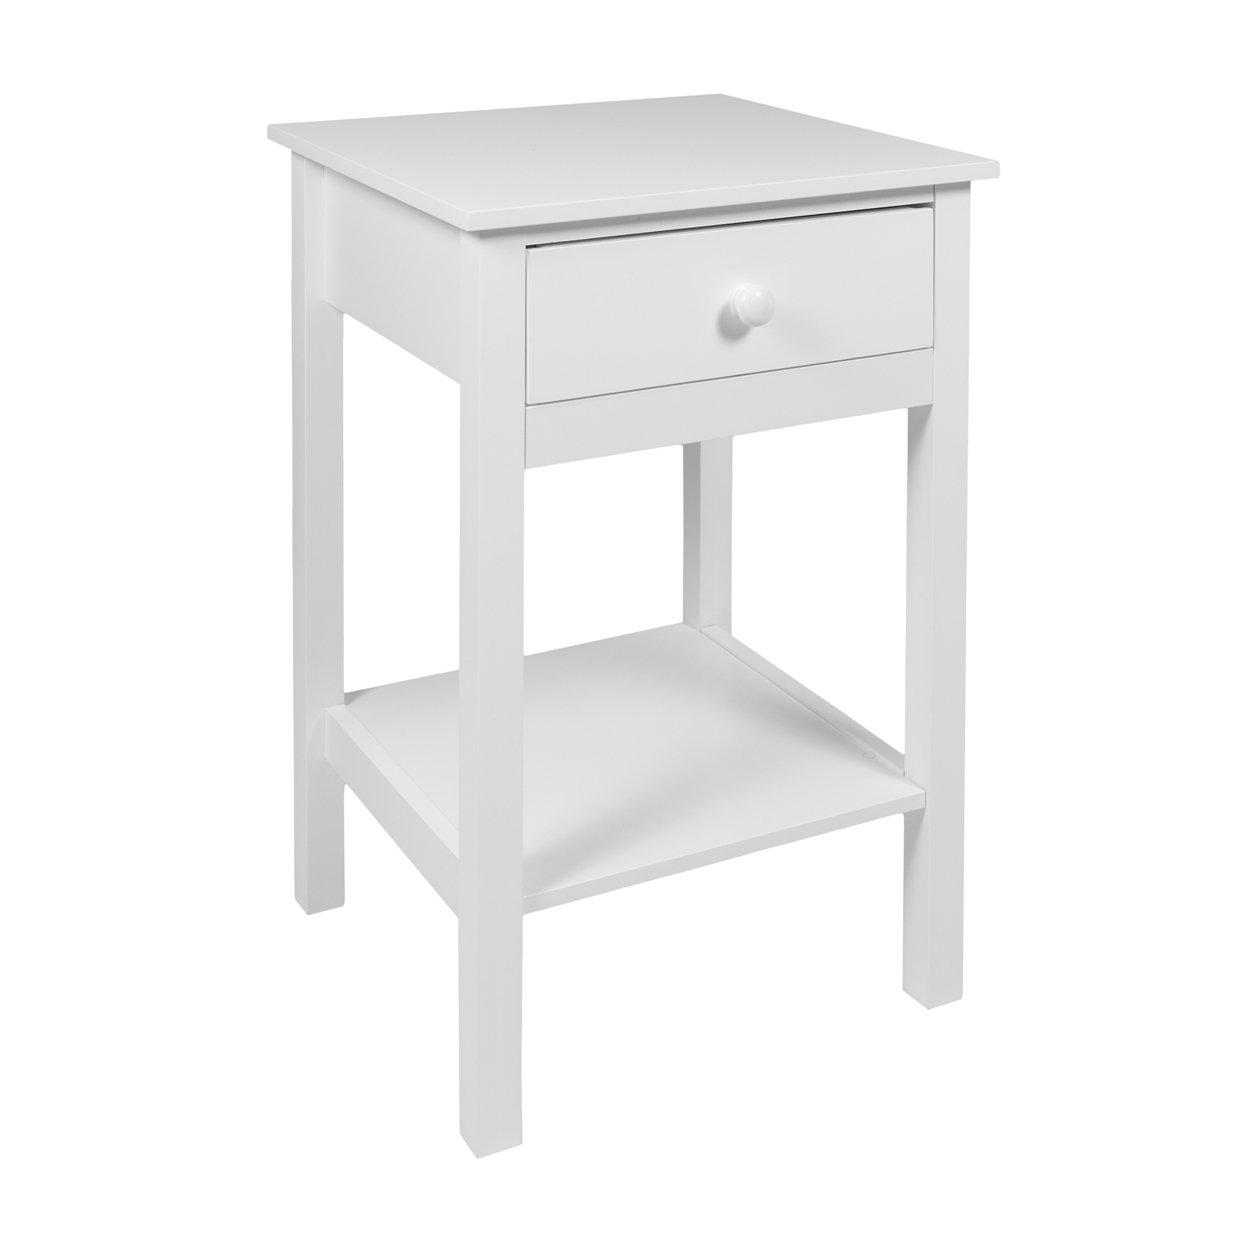 woodluv bedside drawer with shelf cabinet side table storage unit wood white